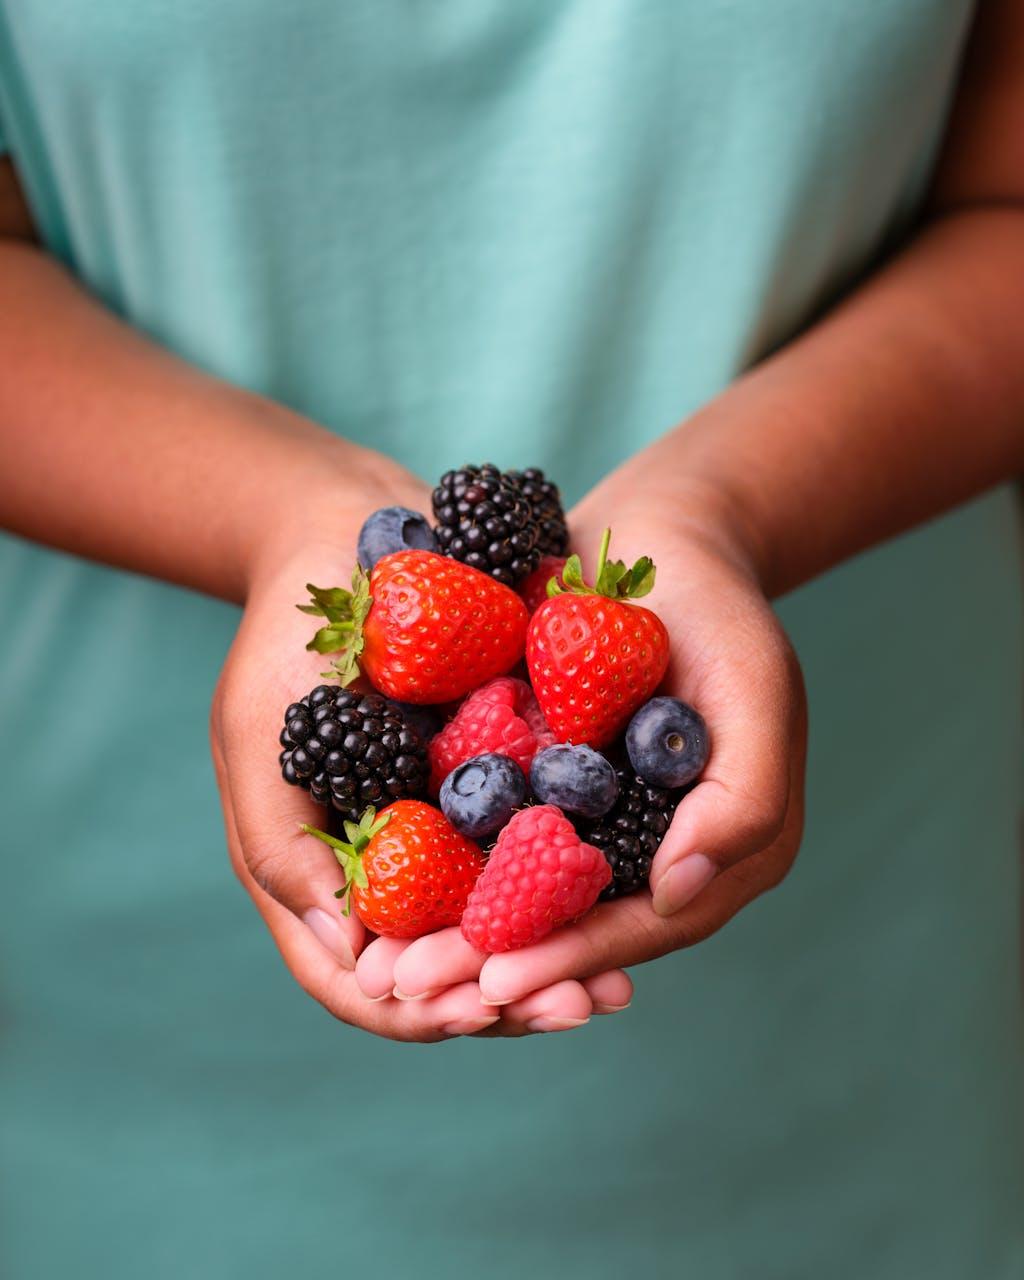 Mixedberryinteraction